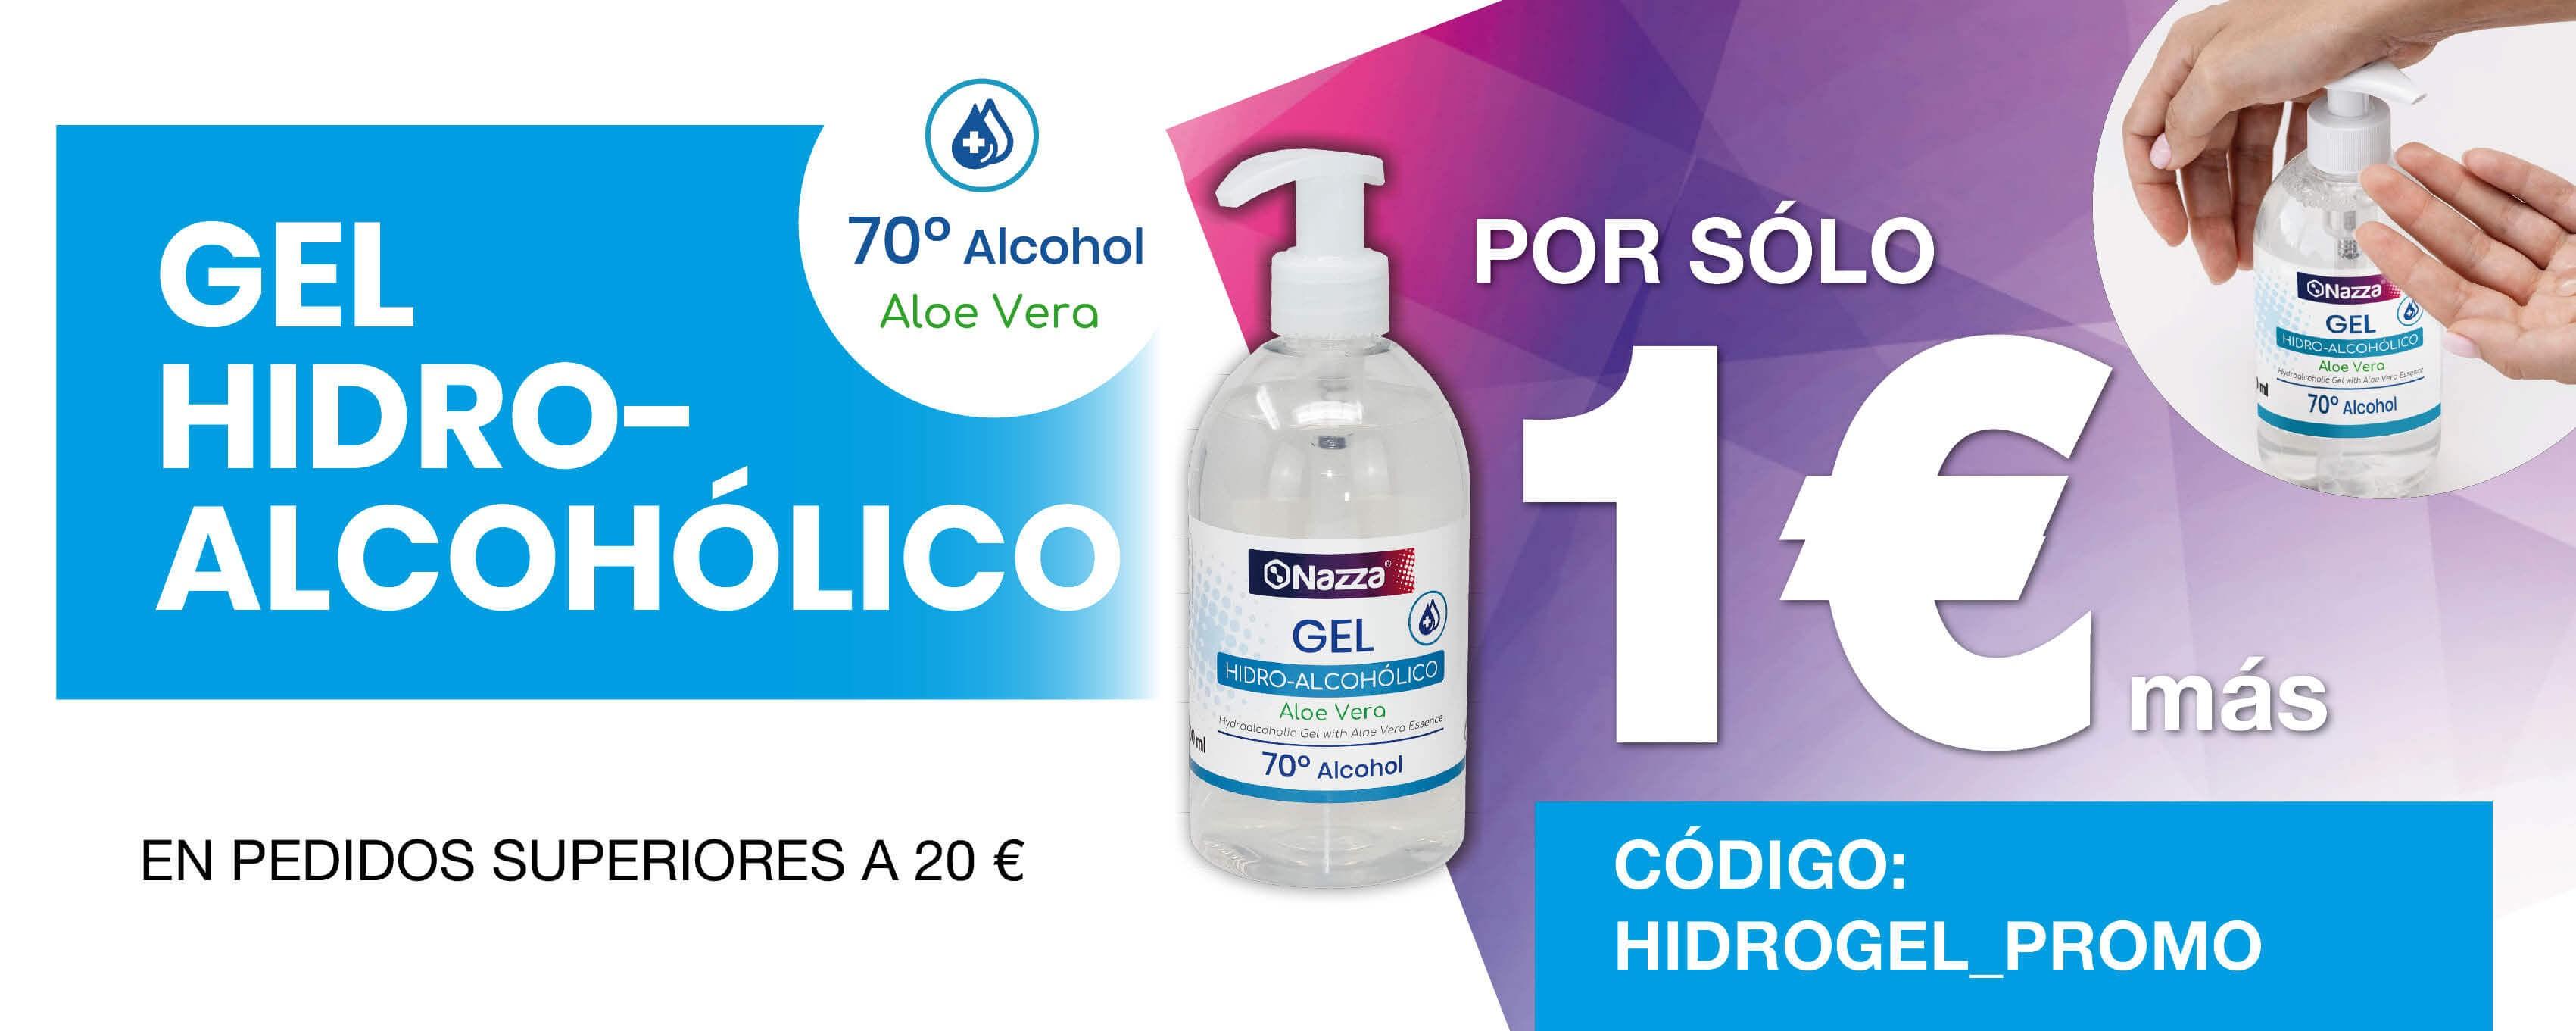 Promoción Gel Hidroalcohólico 1 €